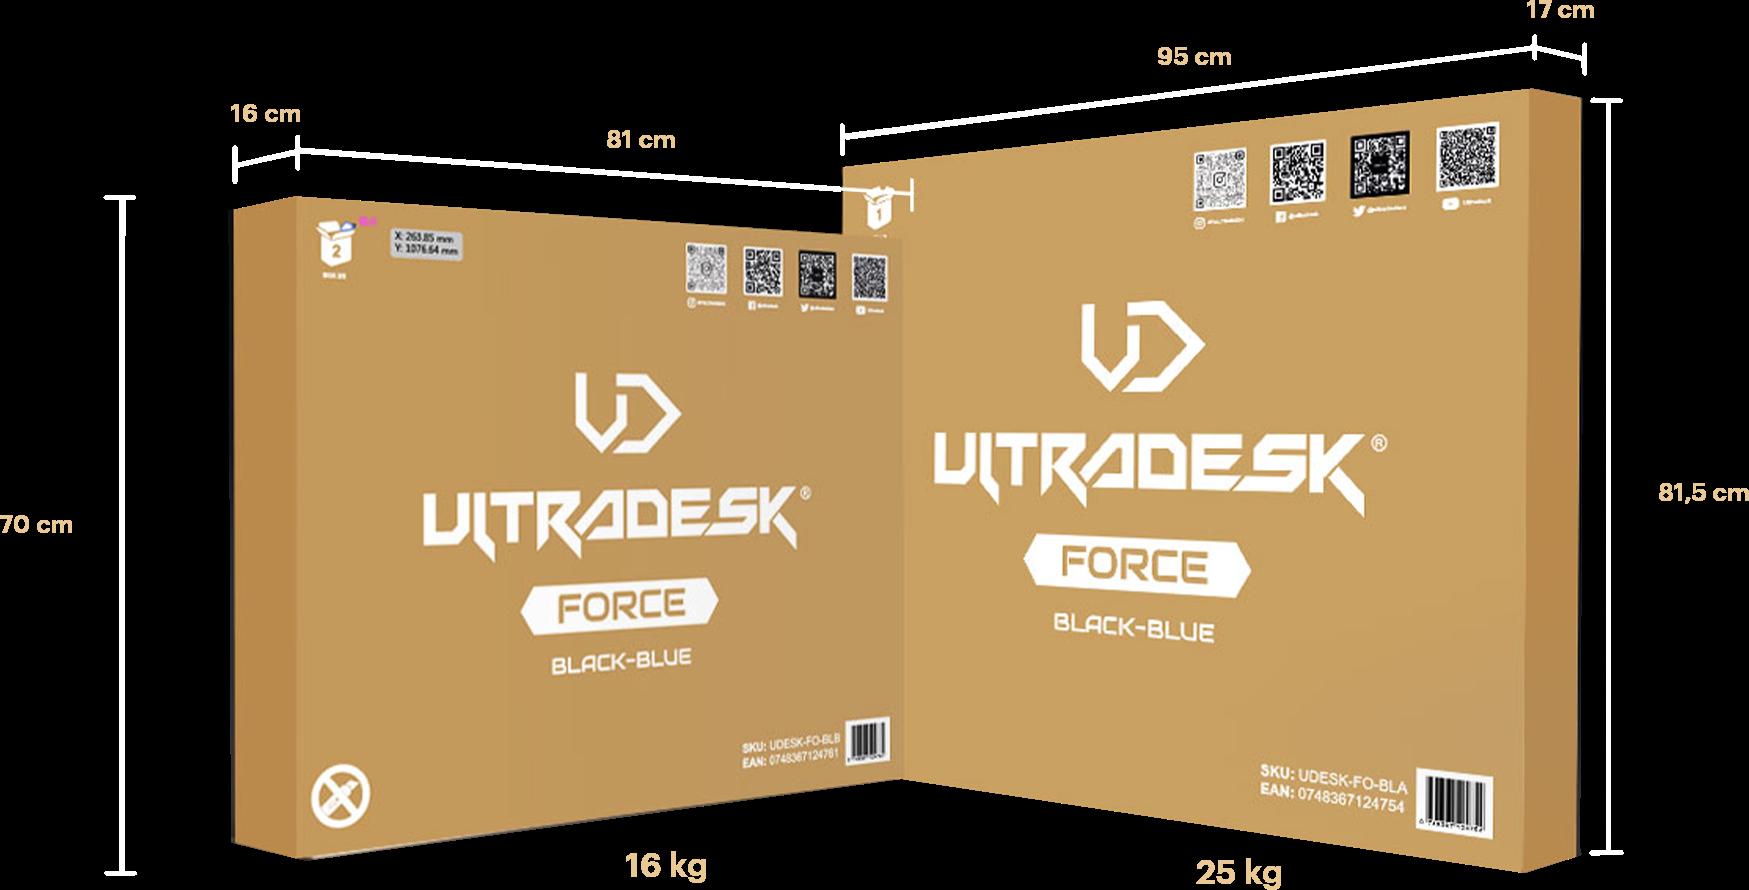 Žaidimų stalas Ultradesk Force Gaming Desk, LED RGB Prismatic